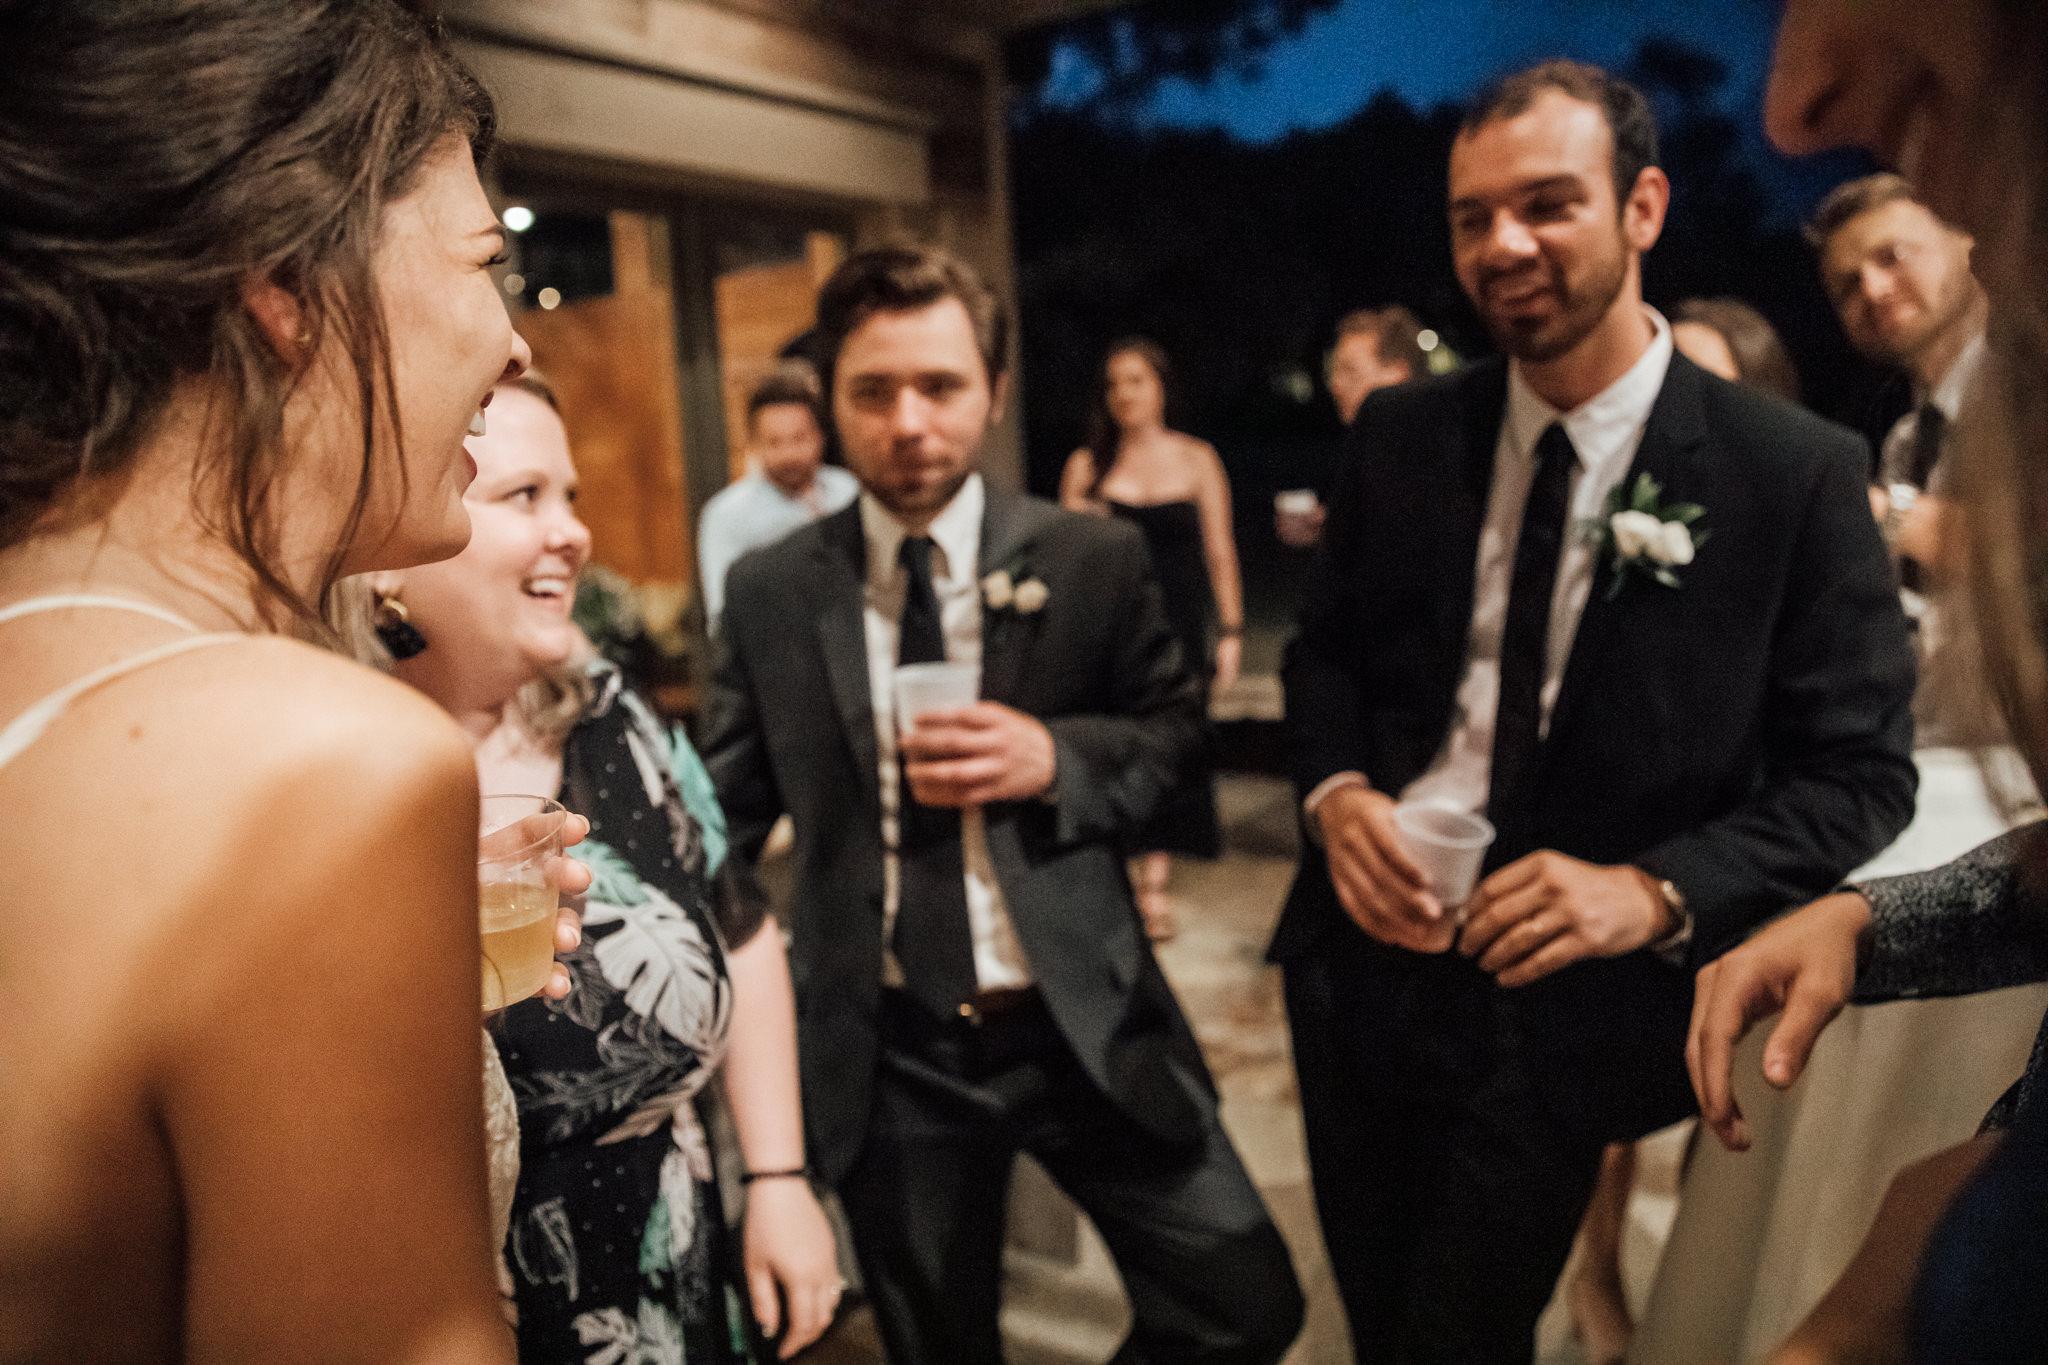 phantom-canyon-brewery-colorado-springs-wedding-photographer-457.jpg